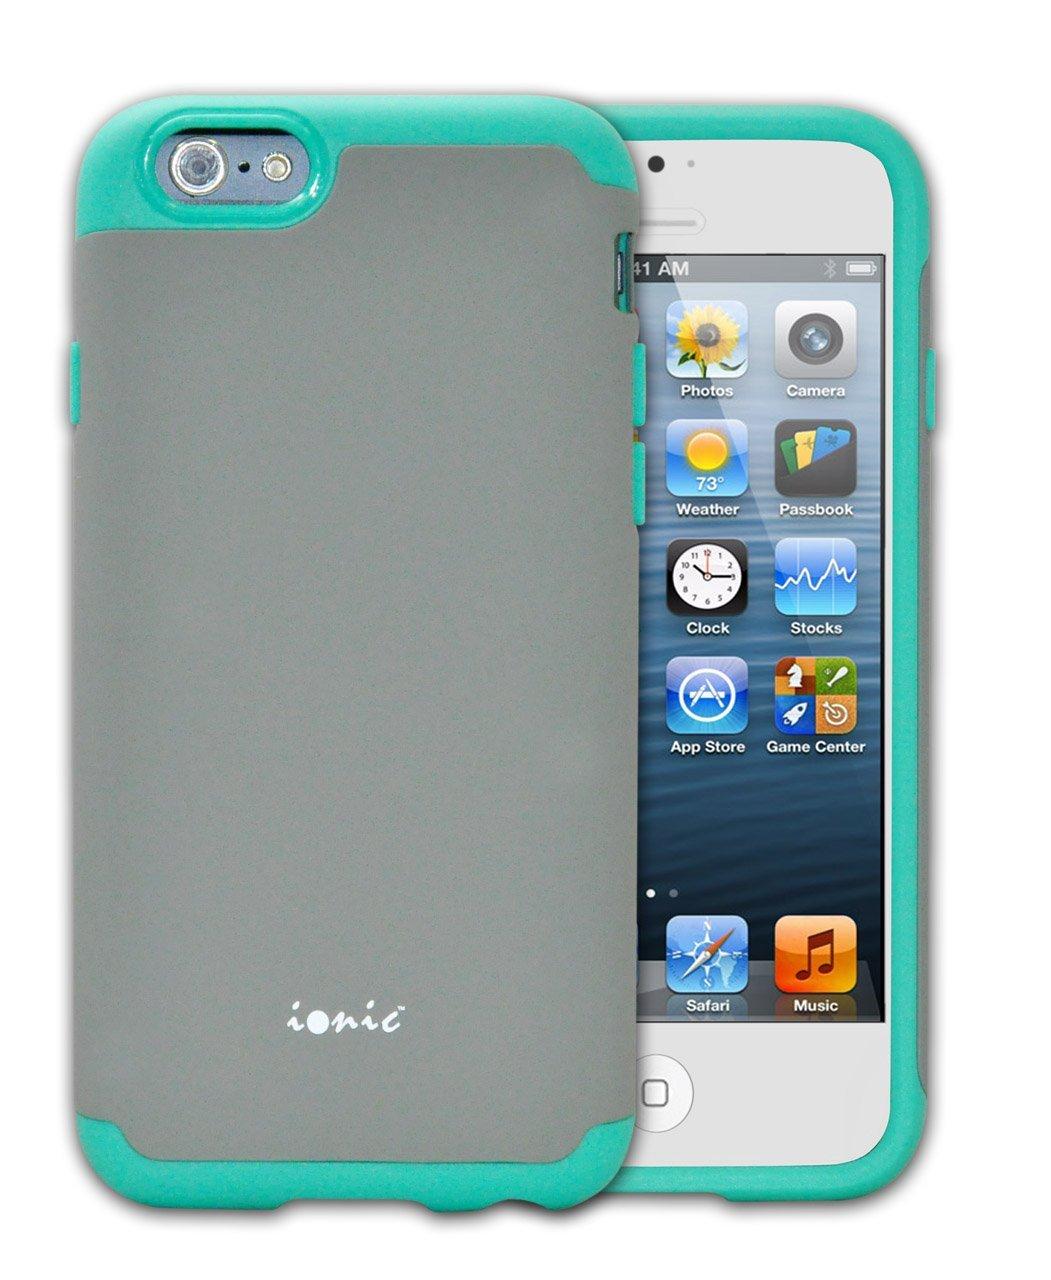 cheap iphone cases, best iphone cases, cheap iphone 6s cases, iphone 6s cases, cheap phone cases, 6s cases